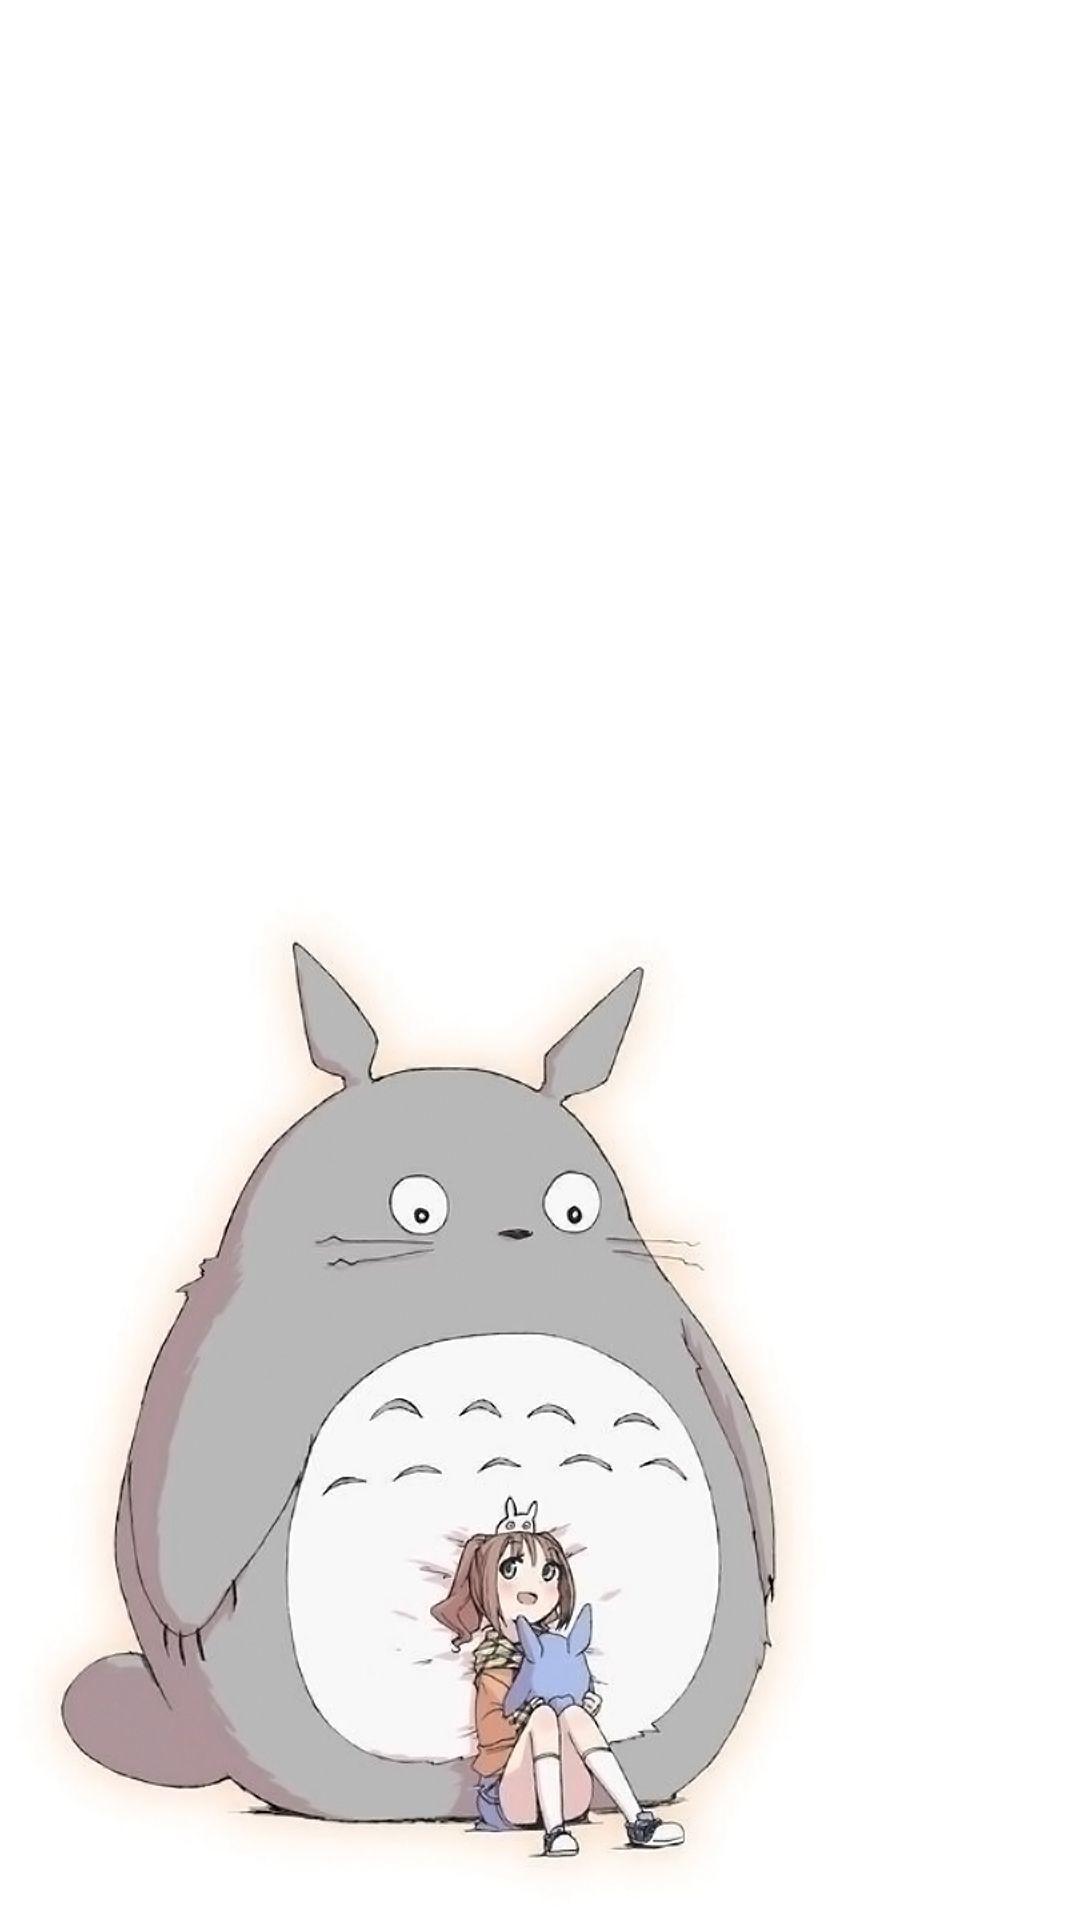 Totoro wallpaper hd wallpapertag - Totoro wallpaper iphone ...